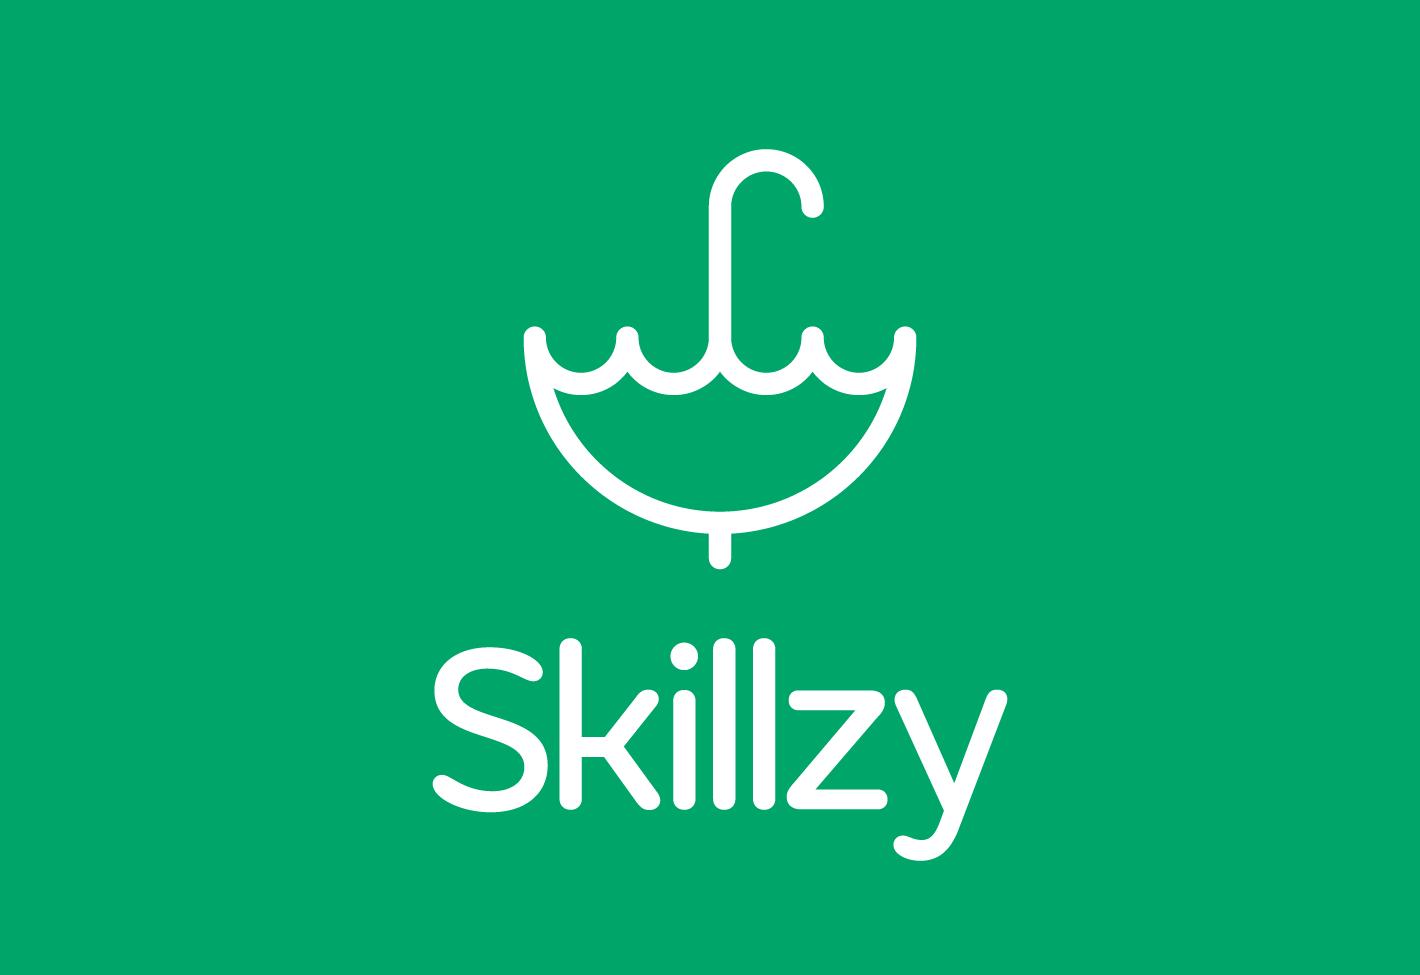 Skillzy logo design